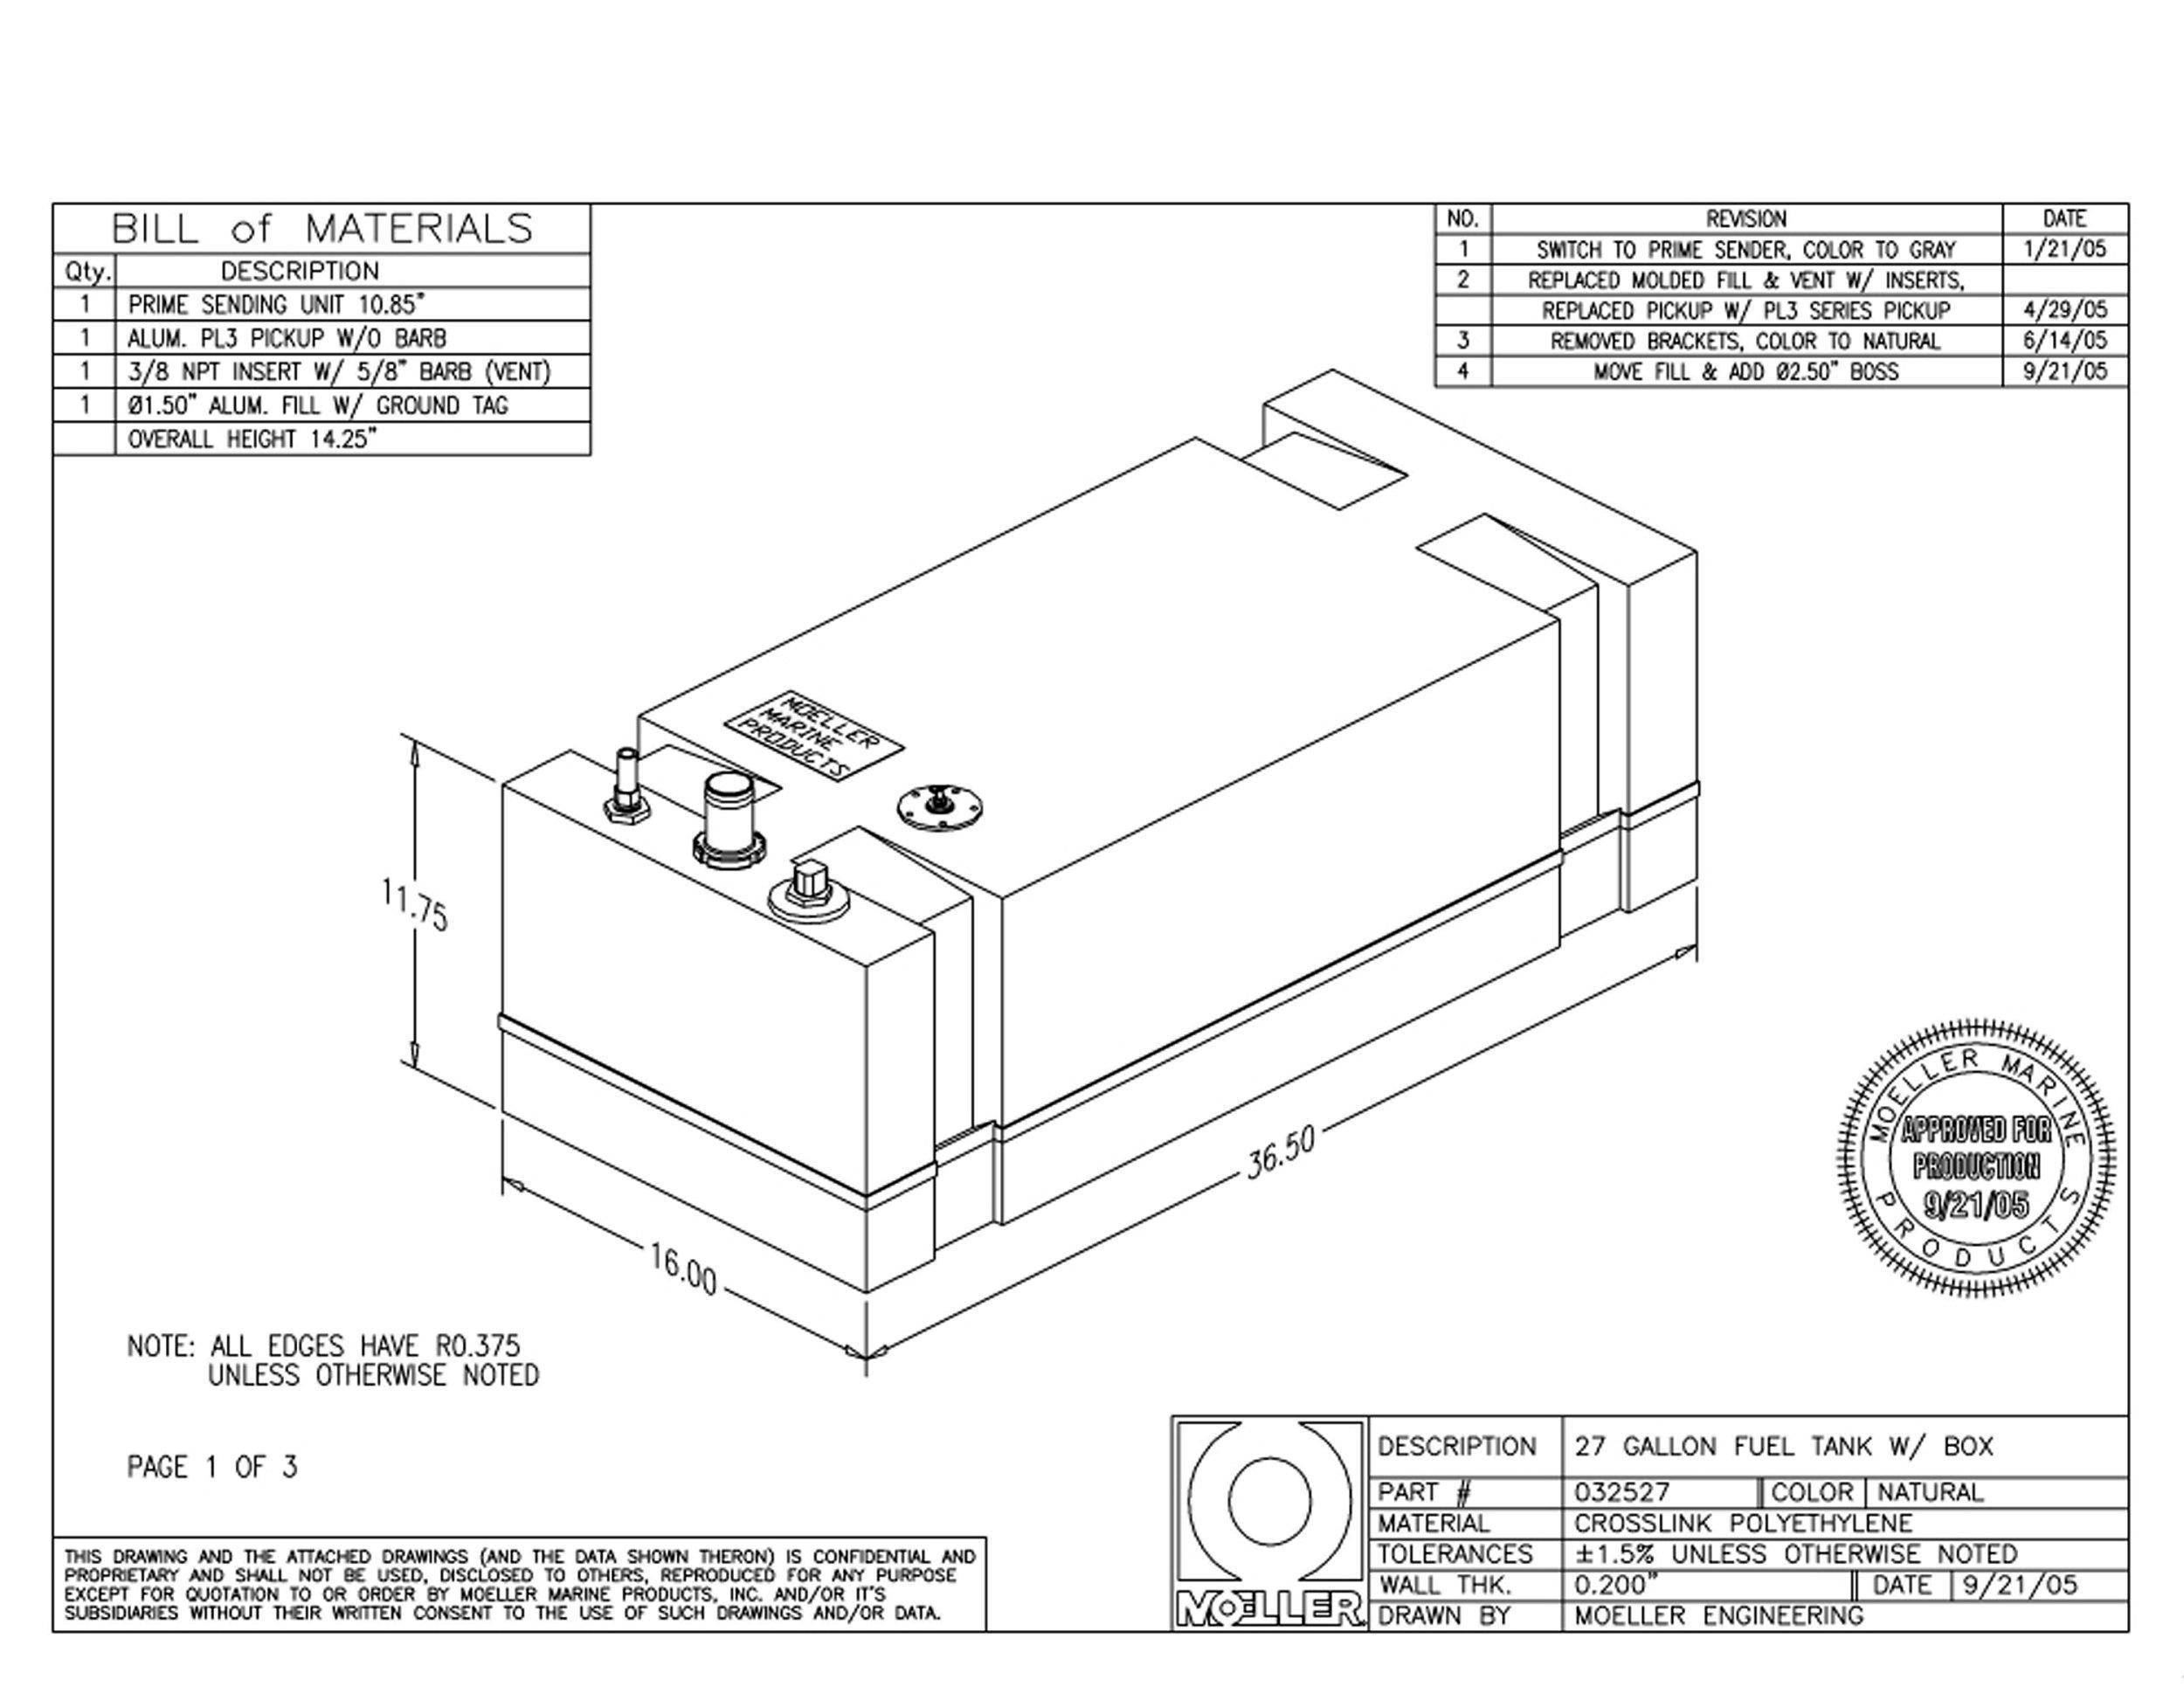 Moeller Marine 032527, Below Deck Permanent Fuel Tank, 27 Gallon - 36.50 in. L x 16.00 in. W x 14.50 in. H by Moeller Marine